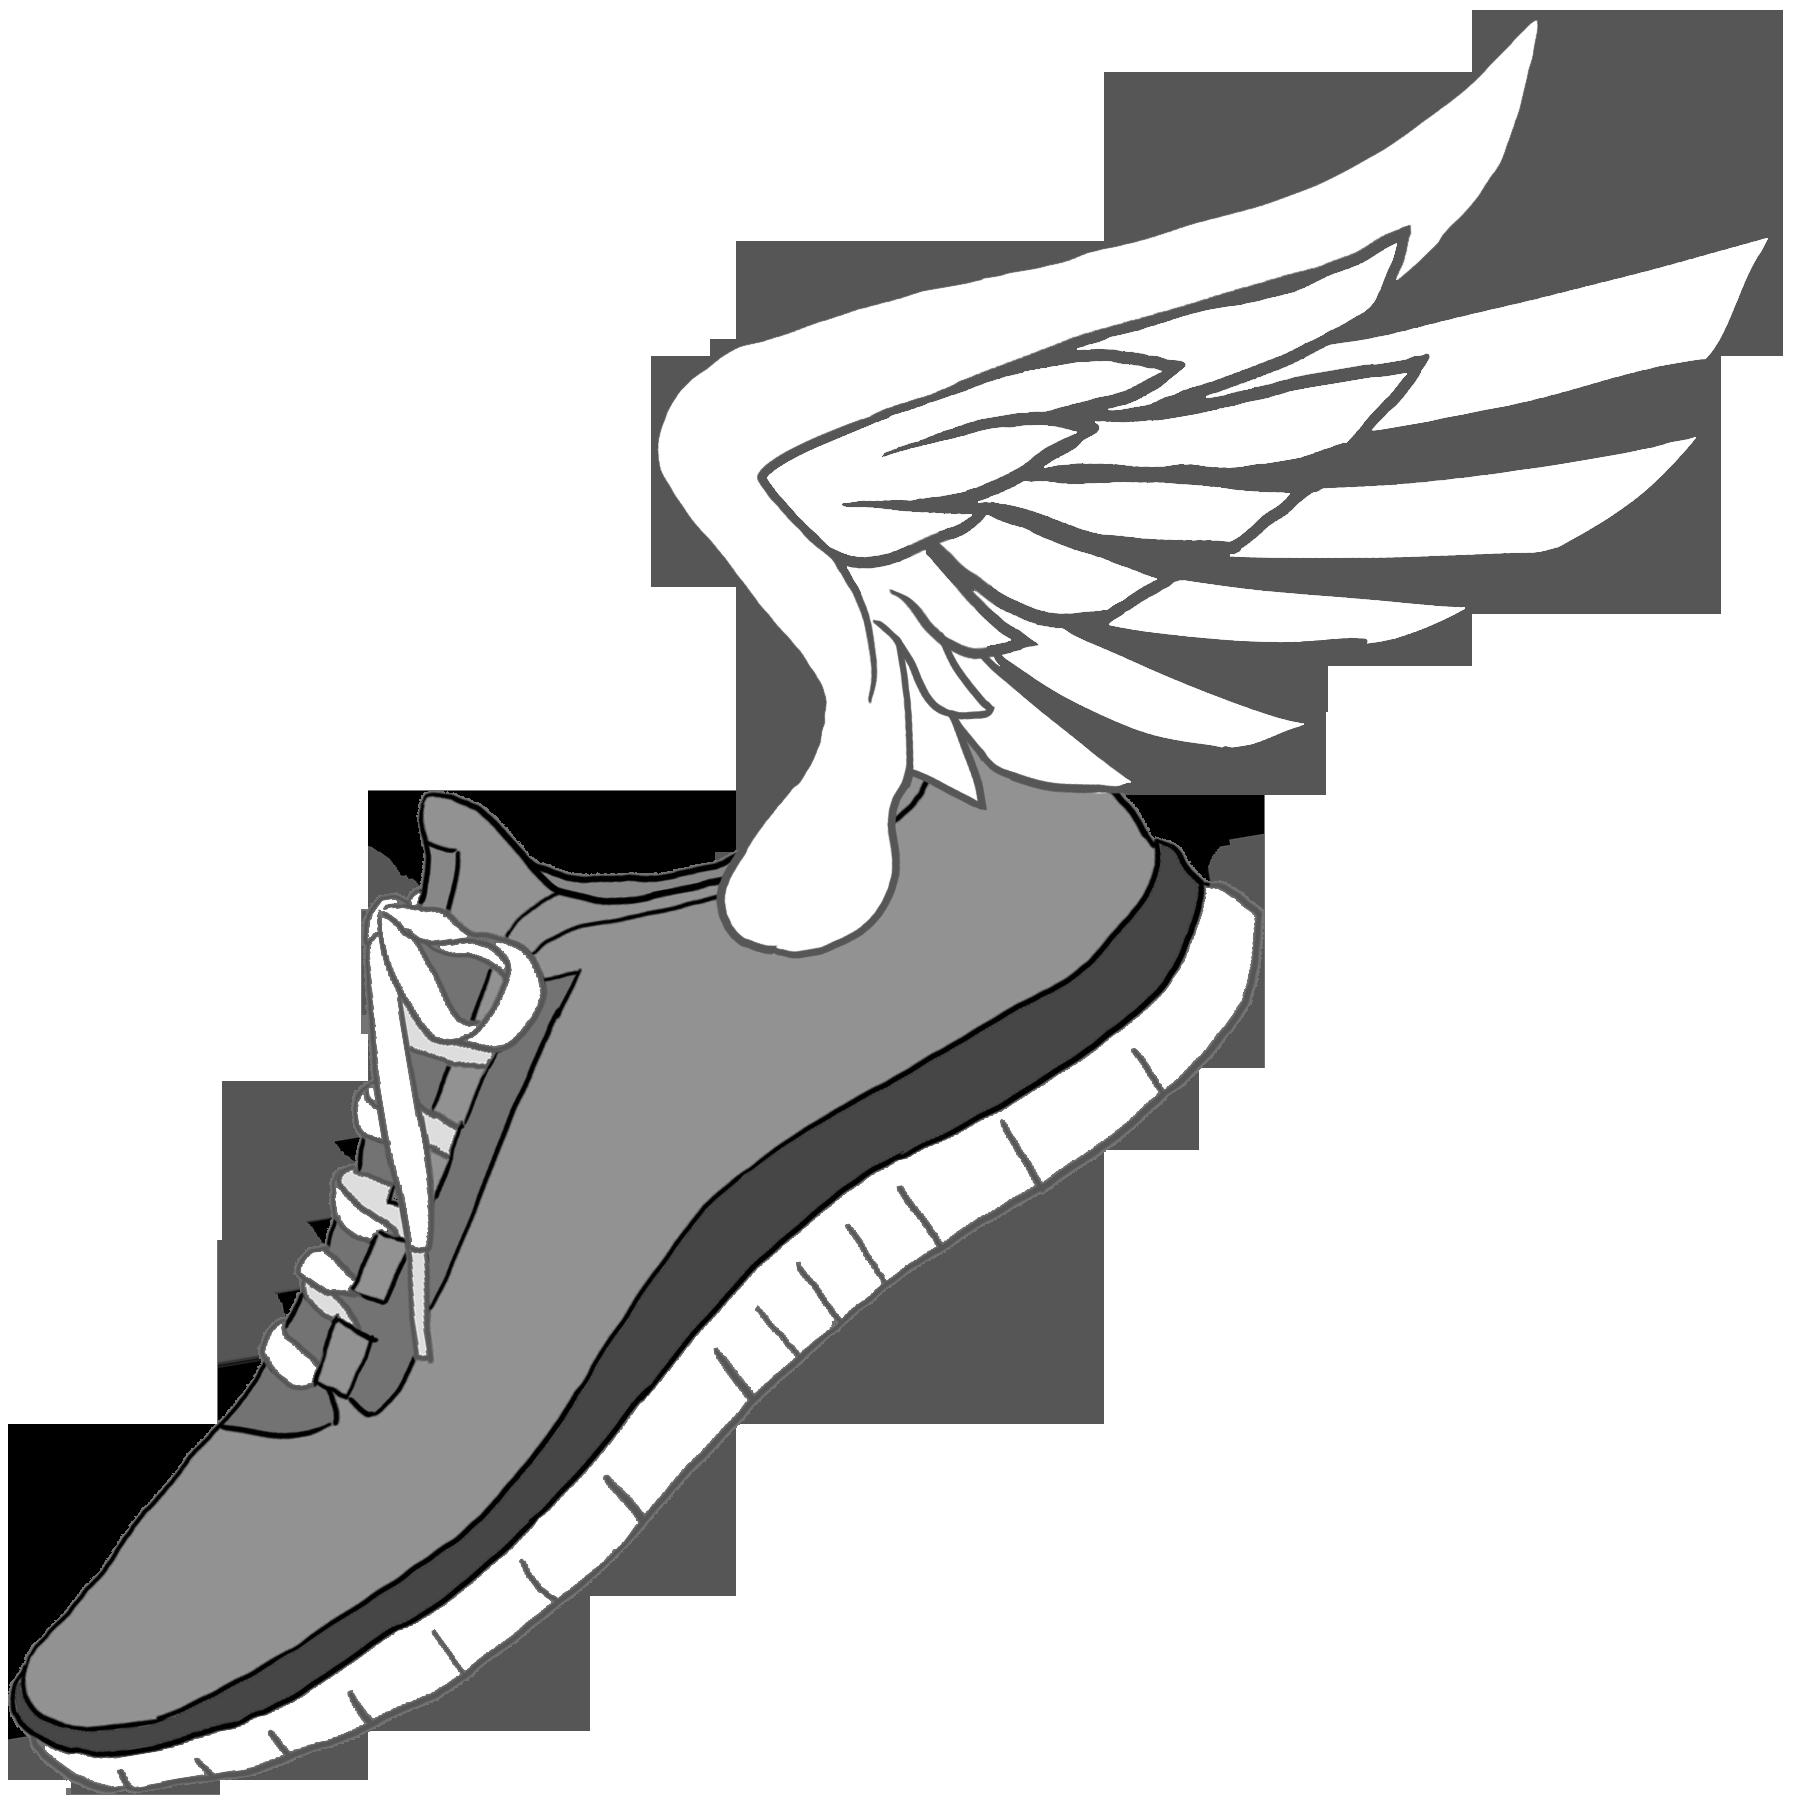 Sneakers Cartoon Drawing Shoe Clip art.